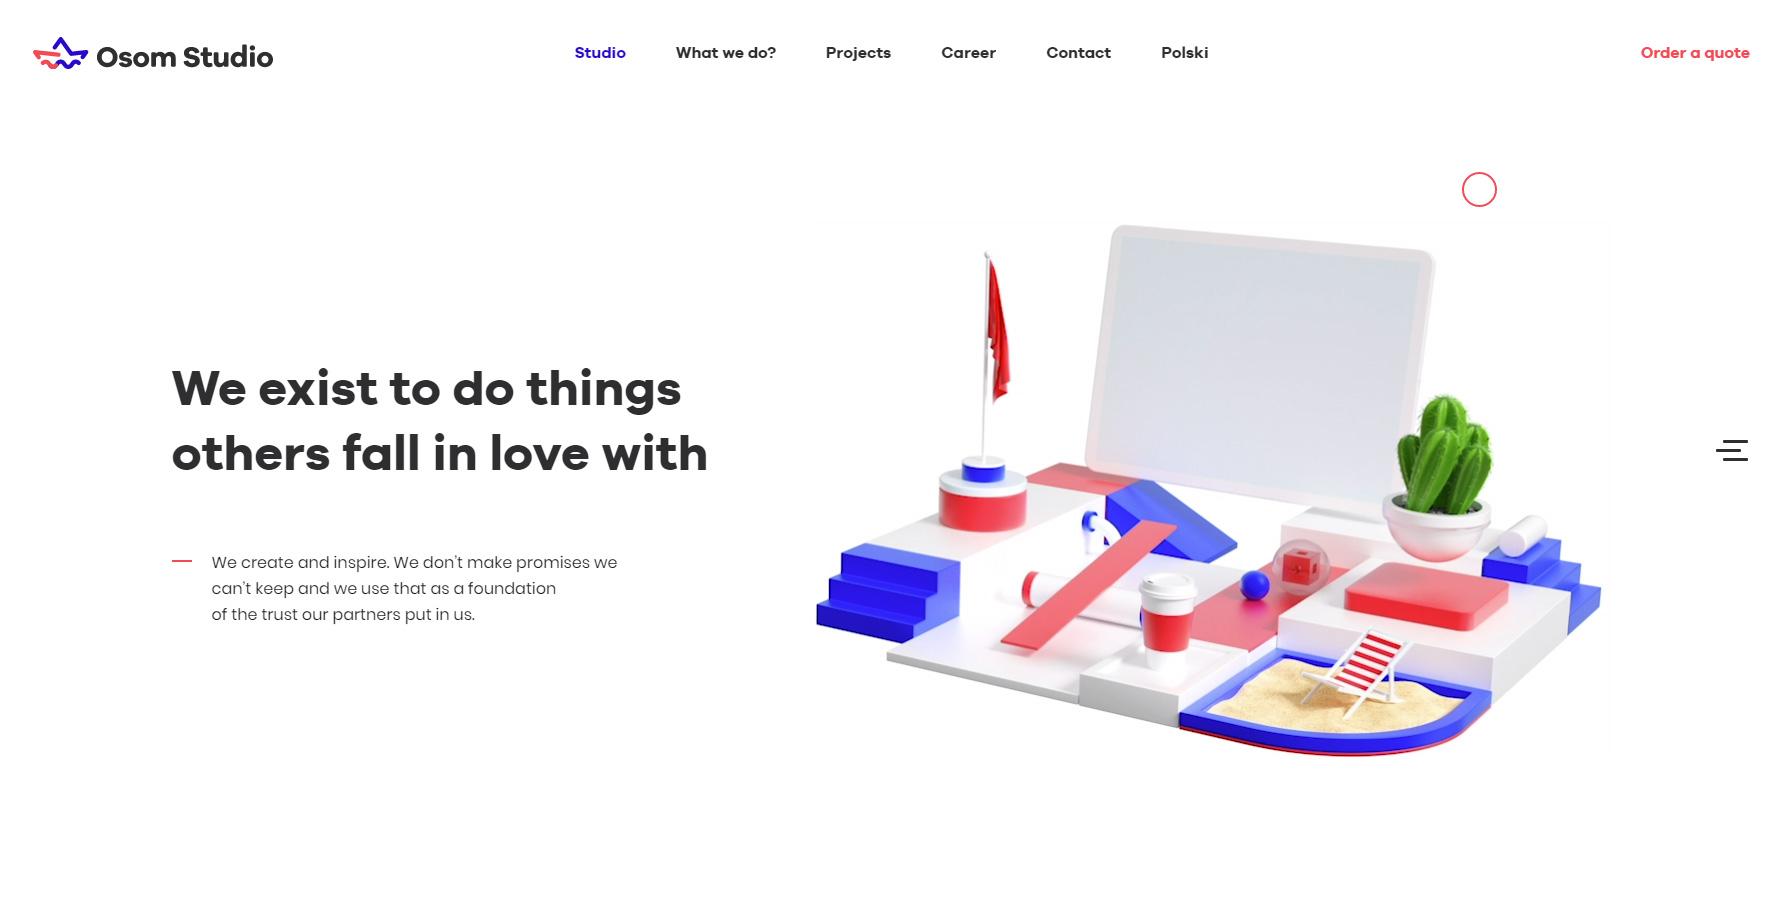 Osom Studio Digital Agency - Website of the Day